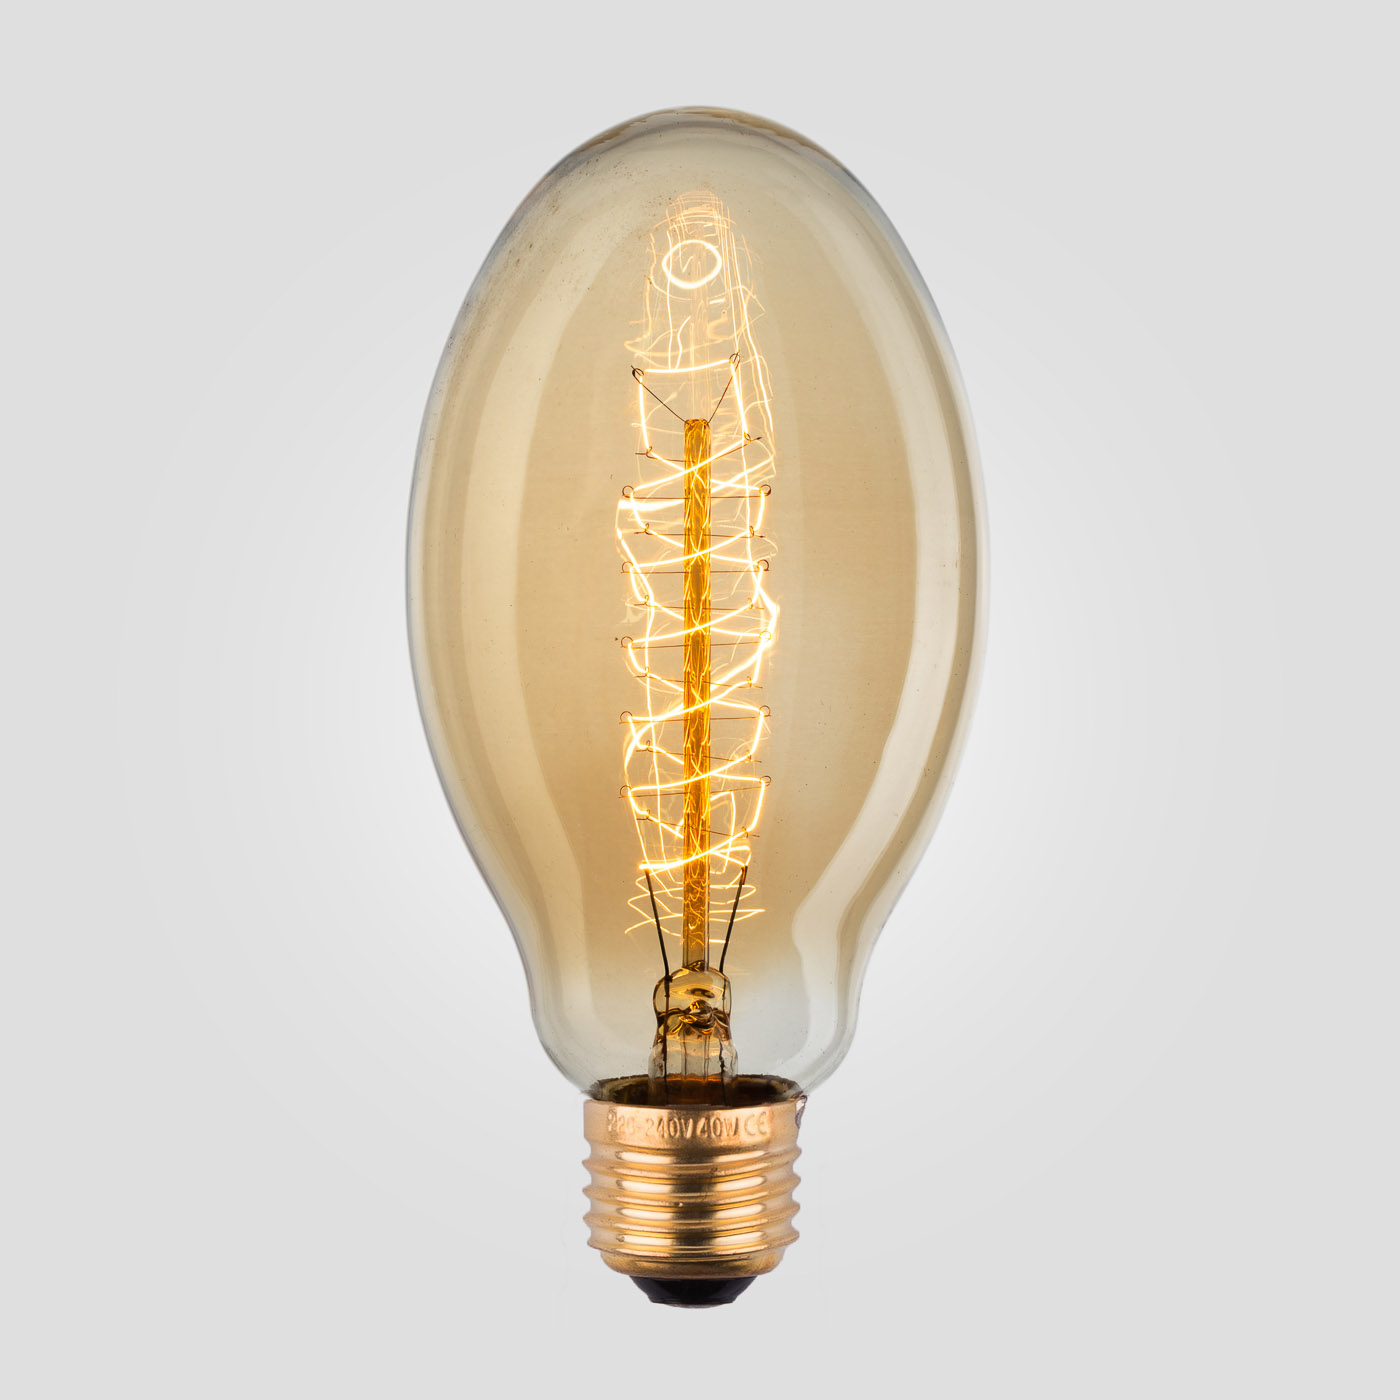 Лампа Эдисона BT75 S